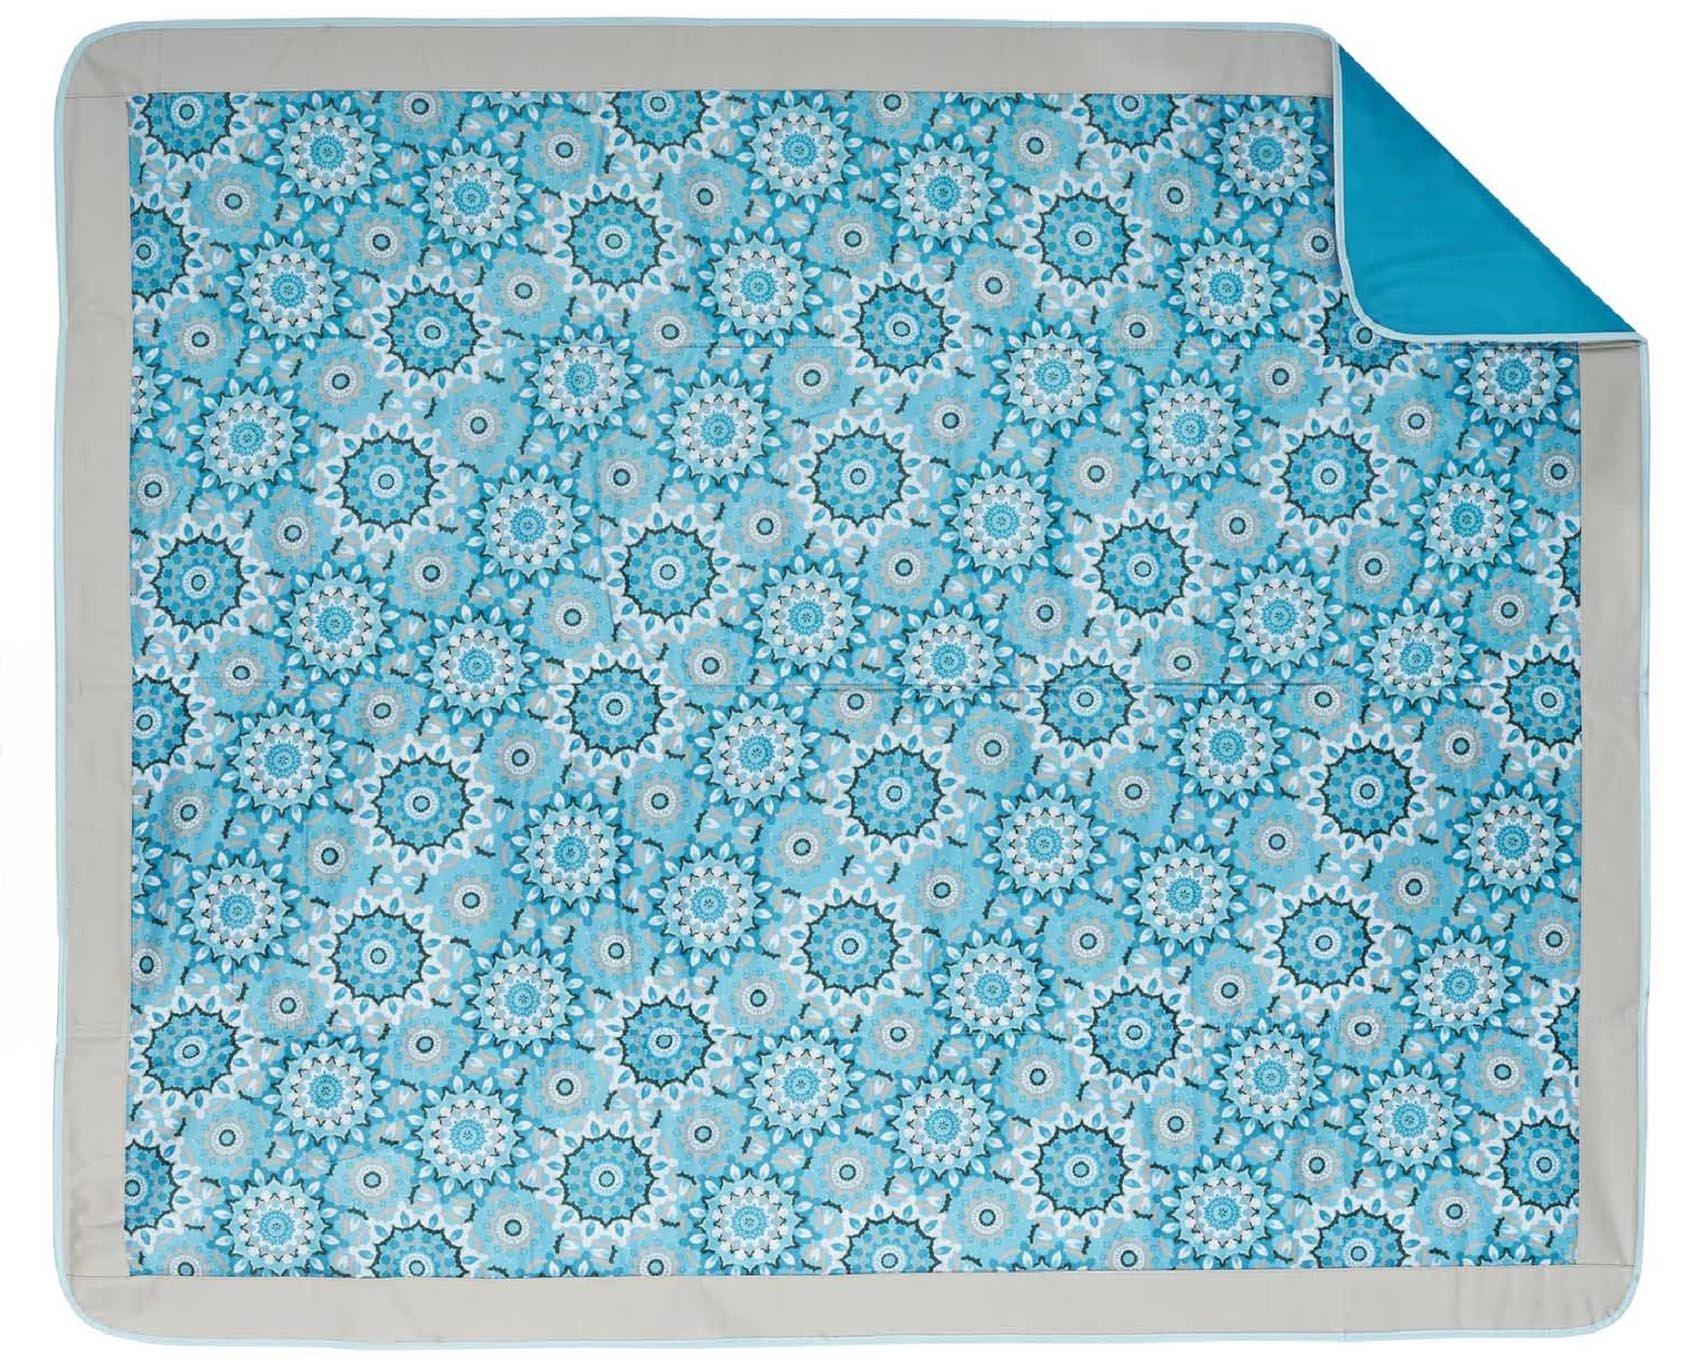 Lightspeed Outdoors Waterproof Folding Outdoor Blanket (Kaleidoscope Blue) by Lightspeed Outdoors